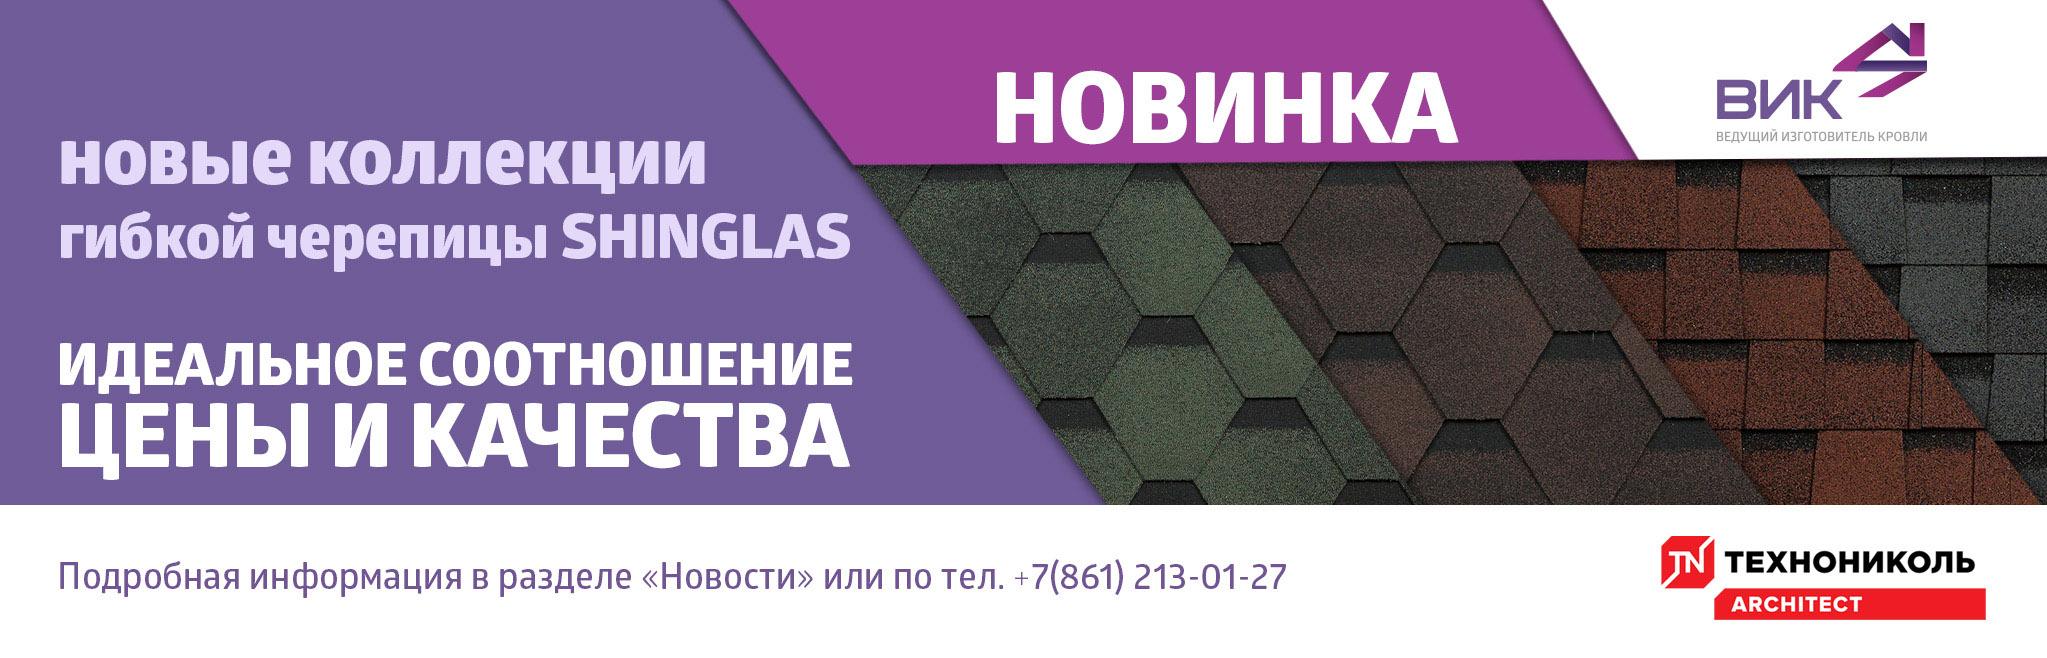 новинка_1